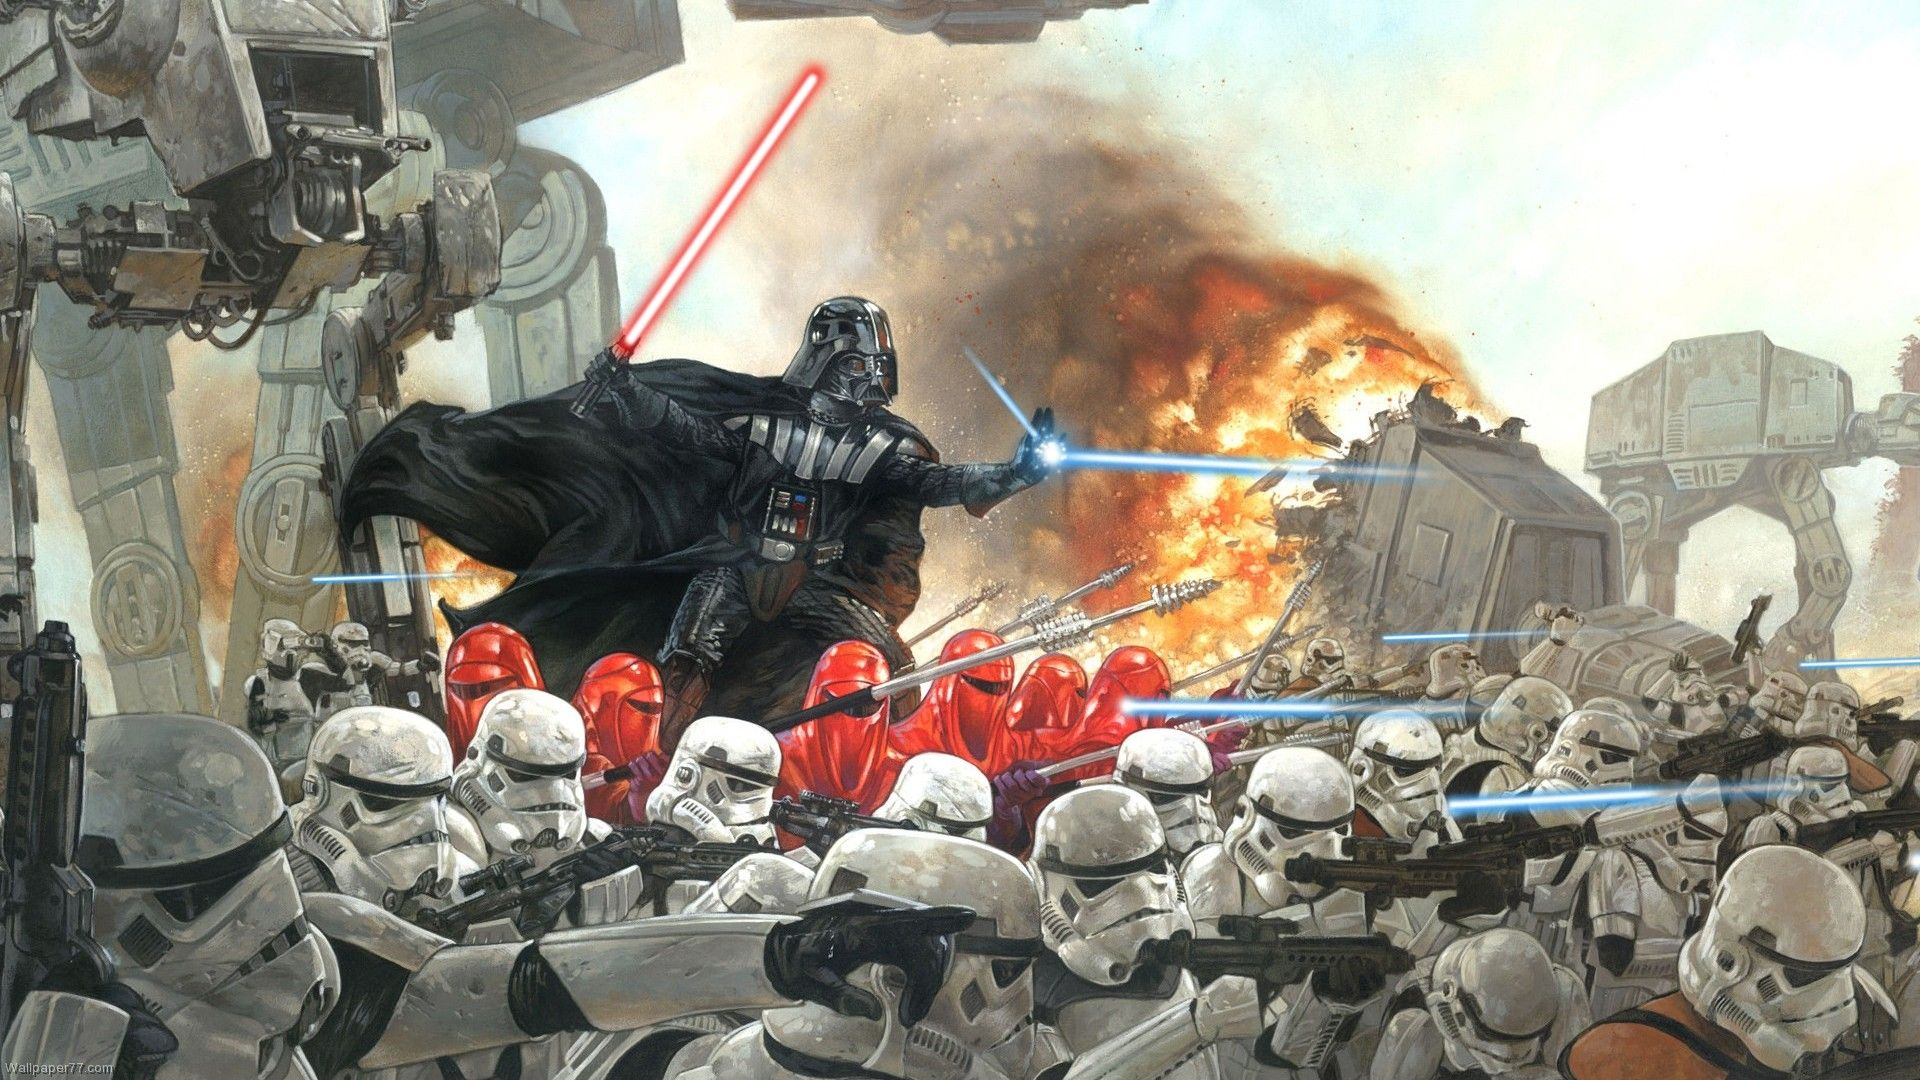 Camera Cachee Star Wars : Army wallpaper desktopwallpapers cache star wars army anime